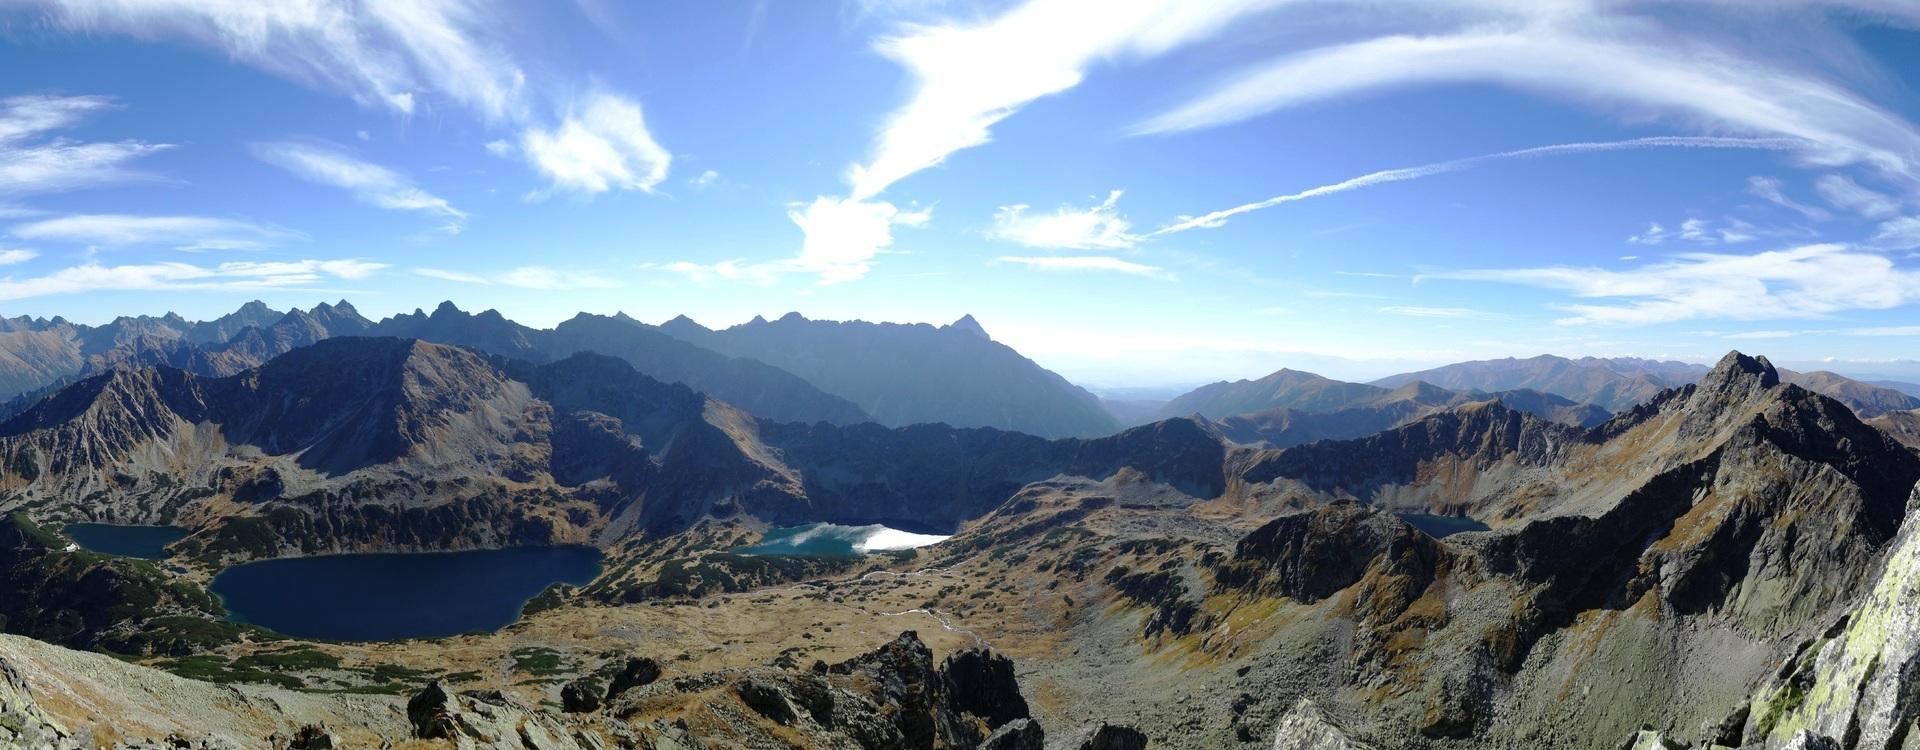 Trekking por montes Tatras. Polonia y Eslovaquia